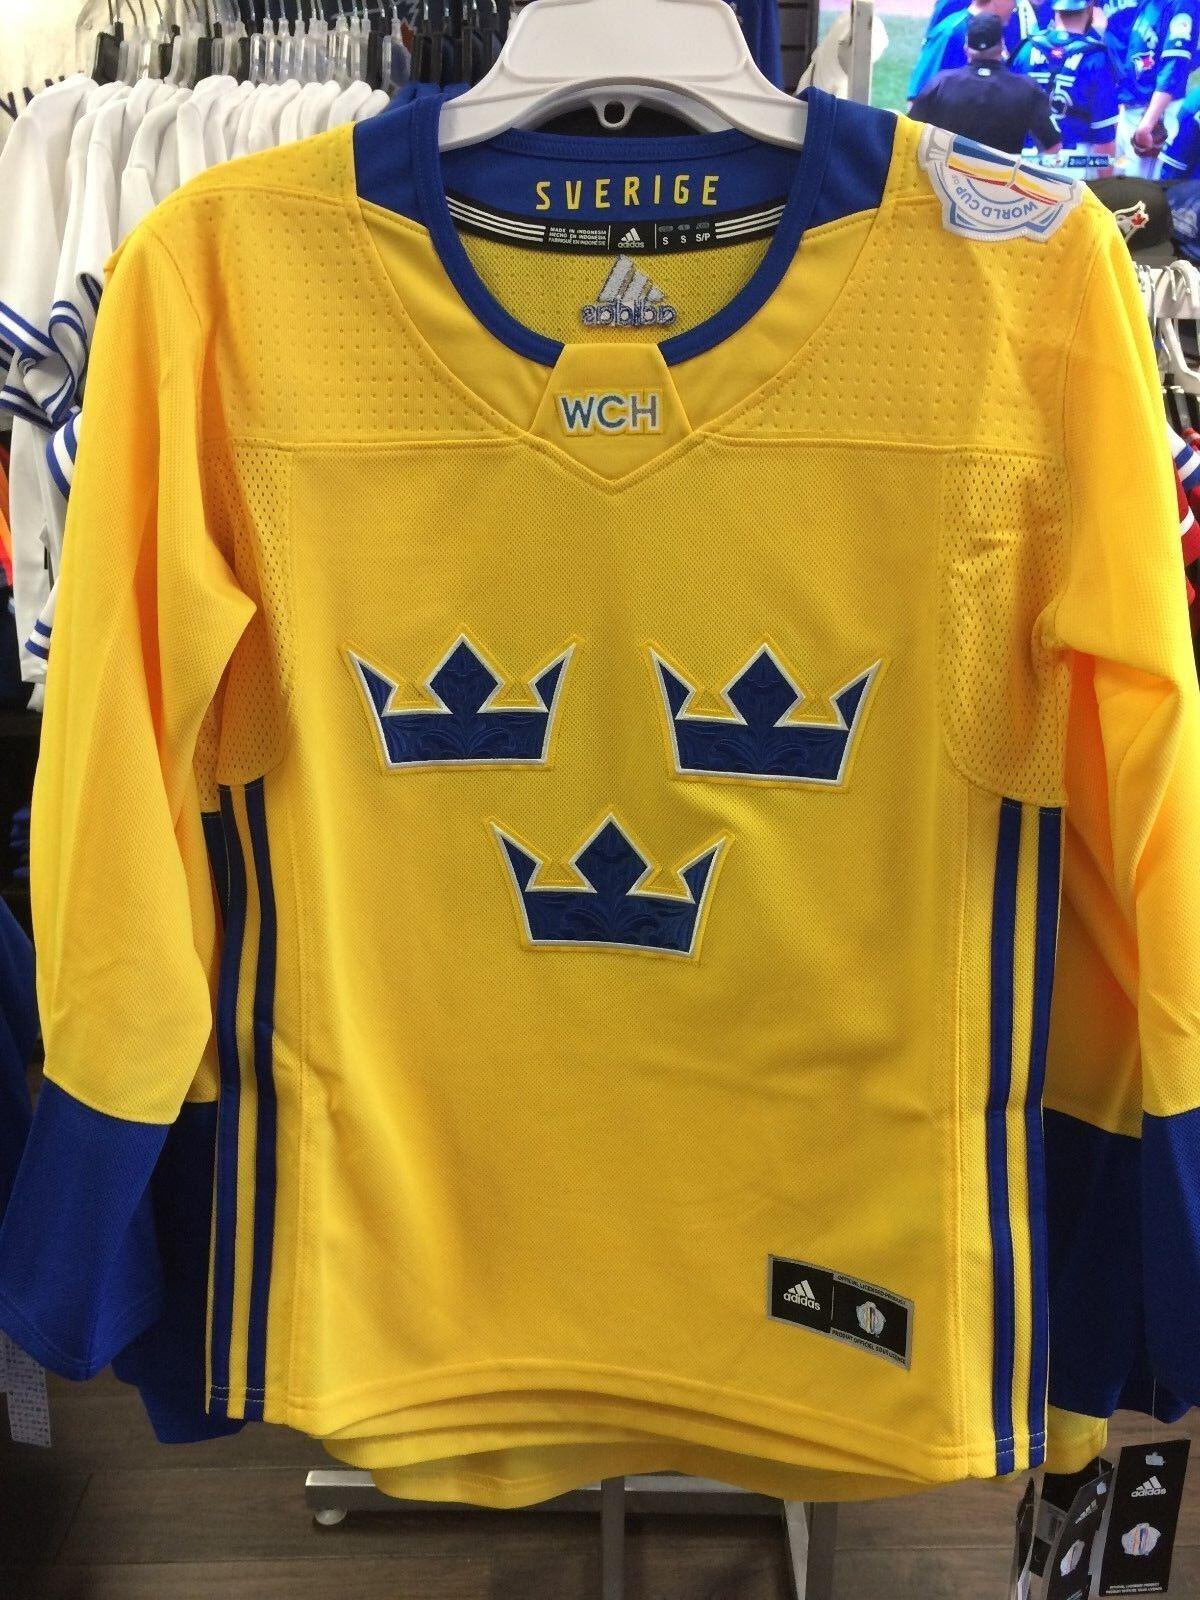 Suède équipe Adidas Jersey réplique grandes dames de hockey 2016